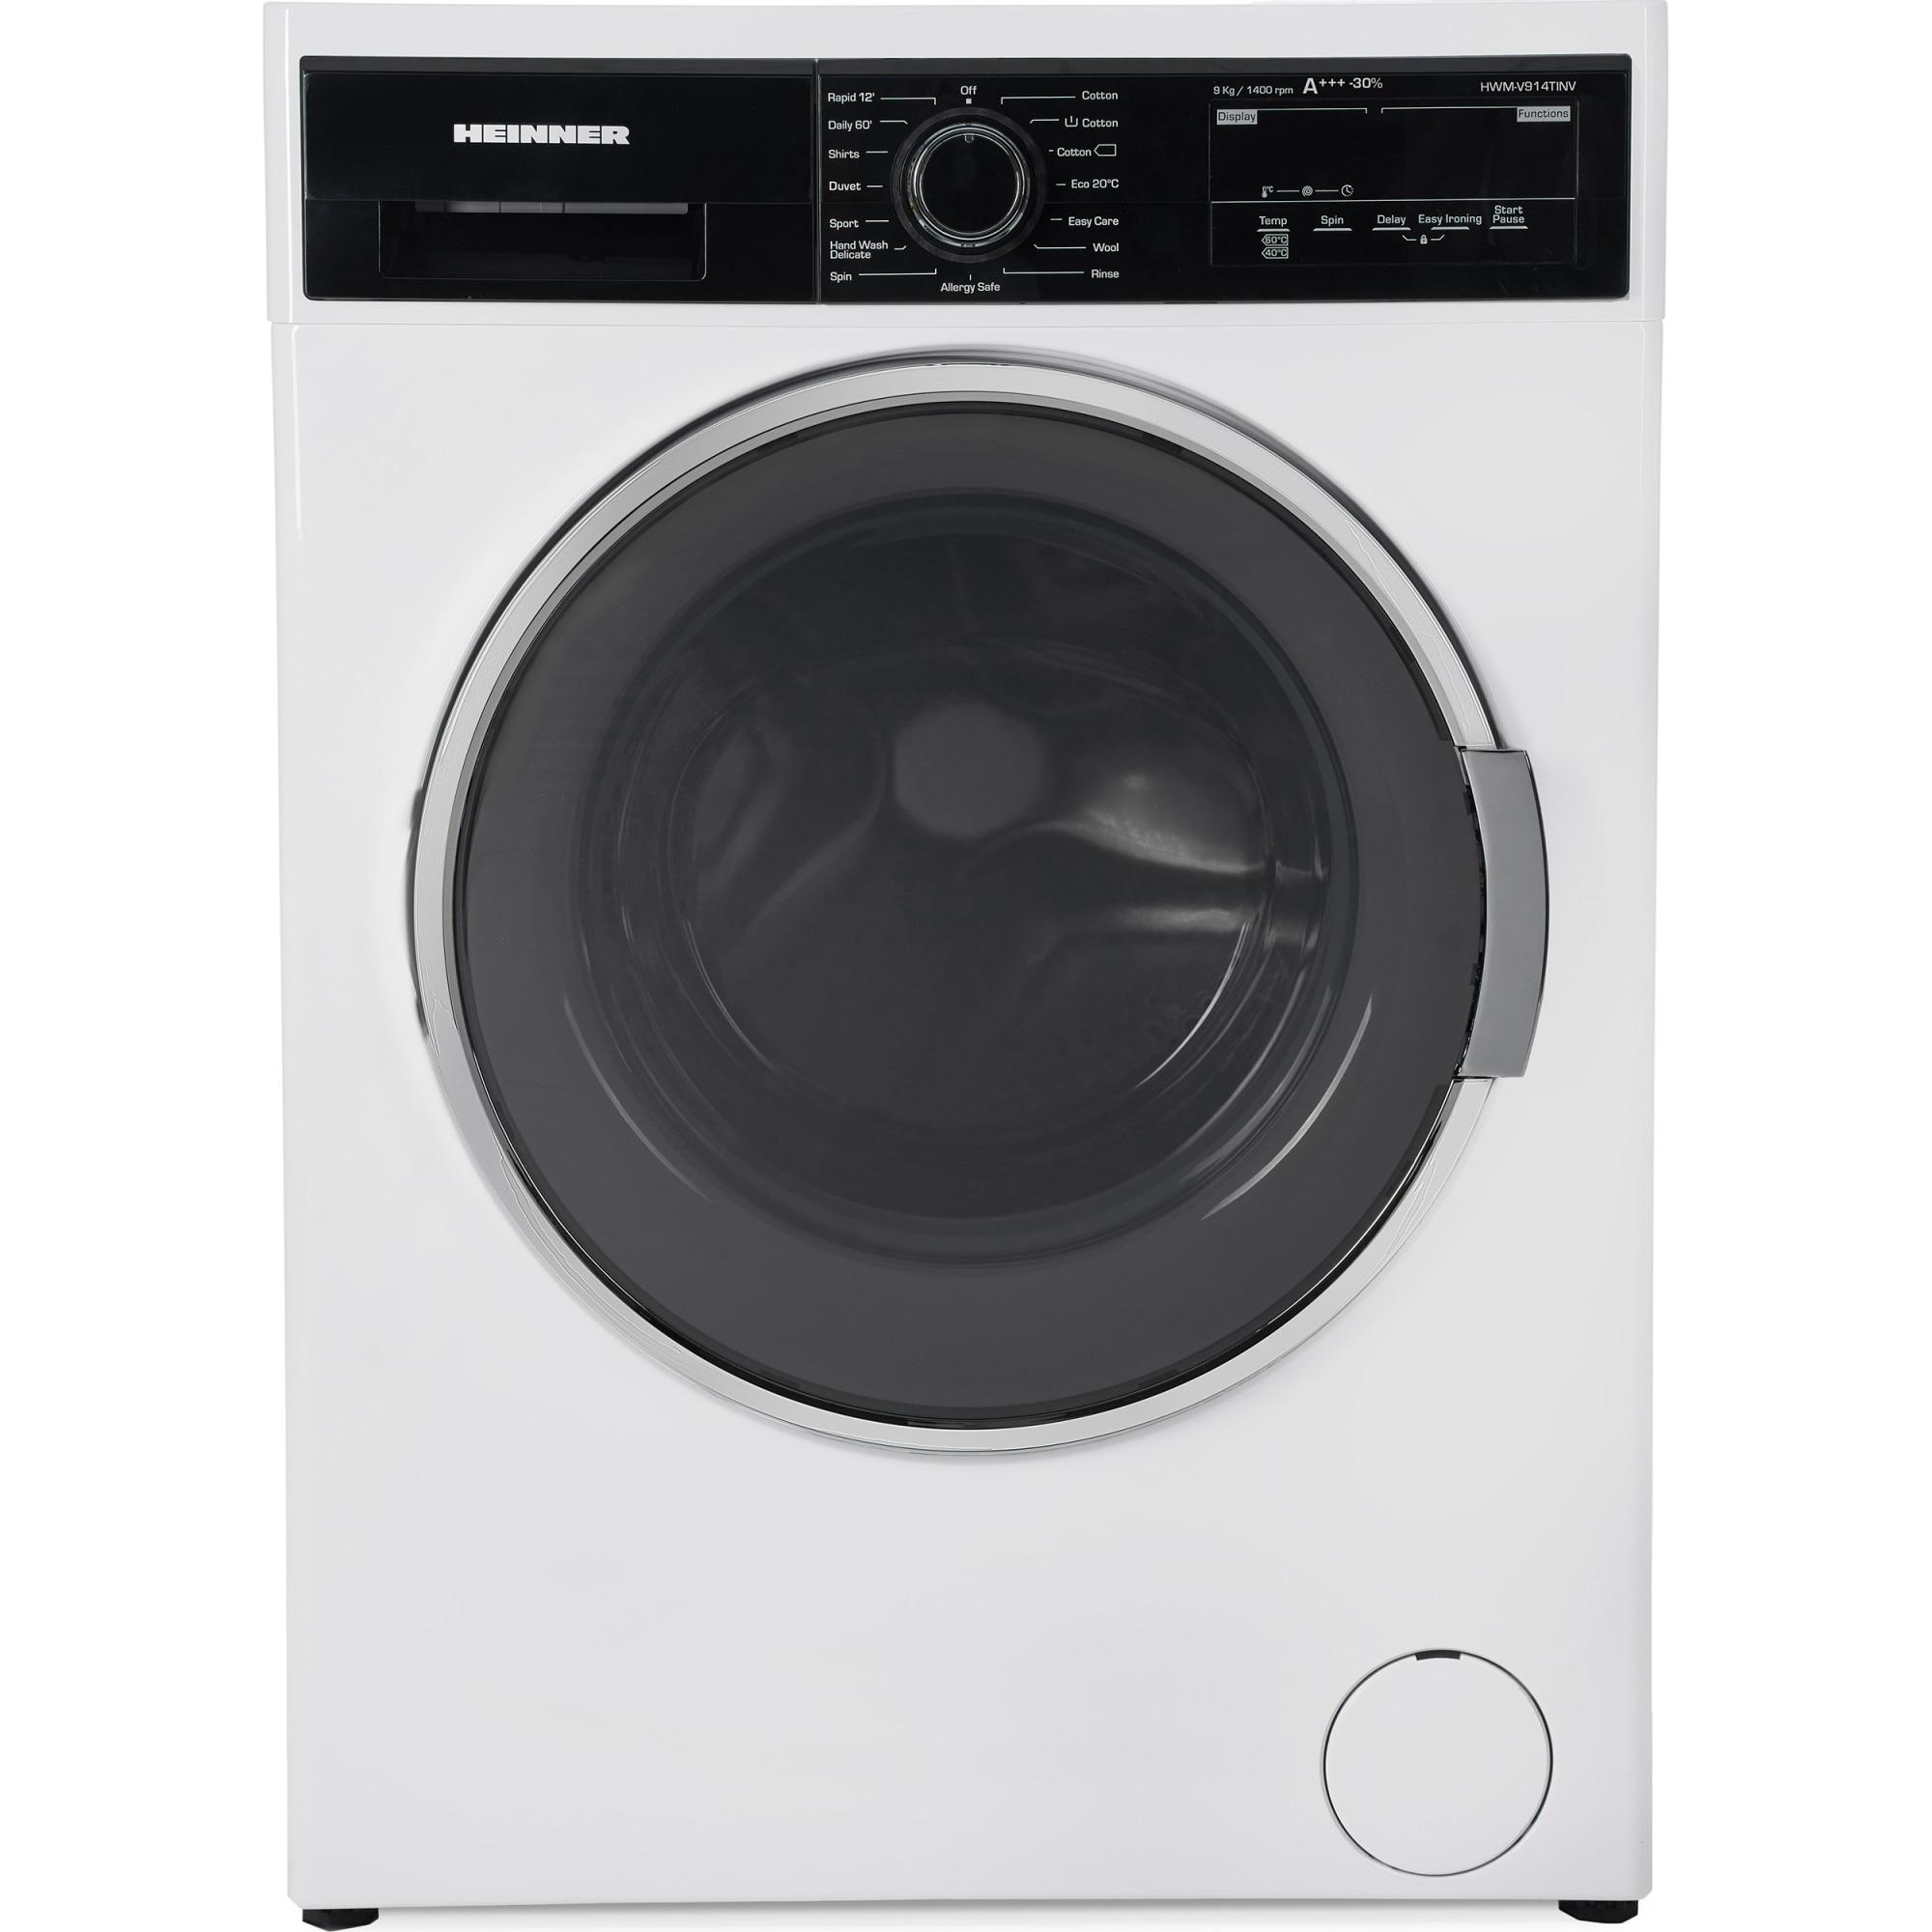 Fotografie Masina de spalat rufe Heinner HWM-V914TINV, 9 Kg, 1400 RPM, Clasa A+++, Display Digital, Touch control, Motor Inverter, 60 cm, Alb